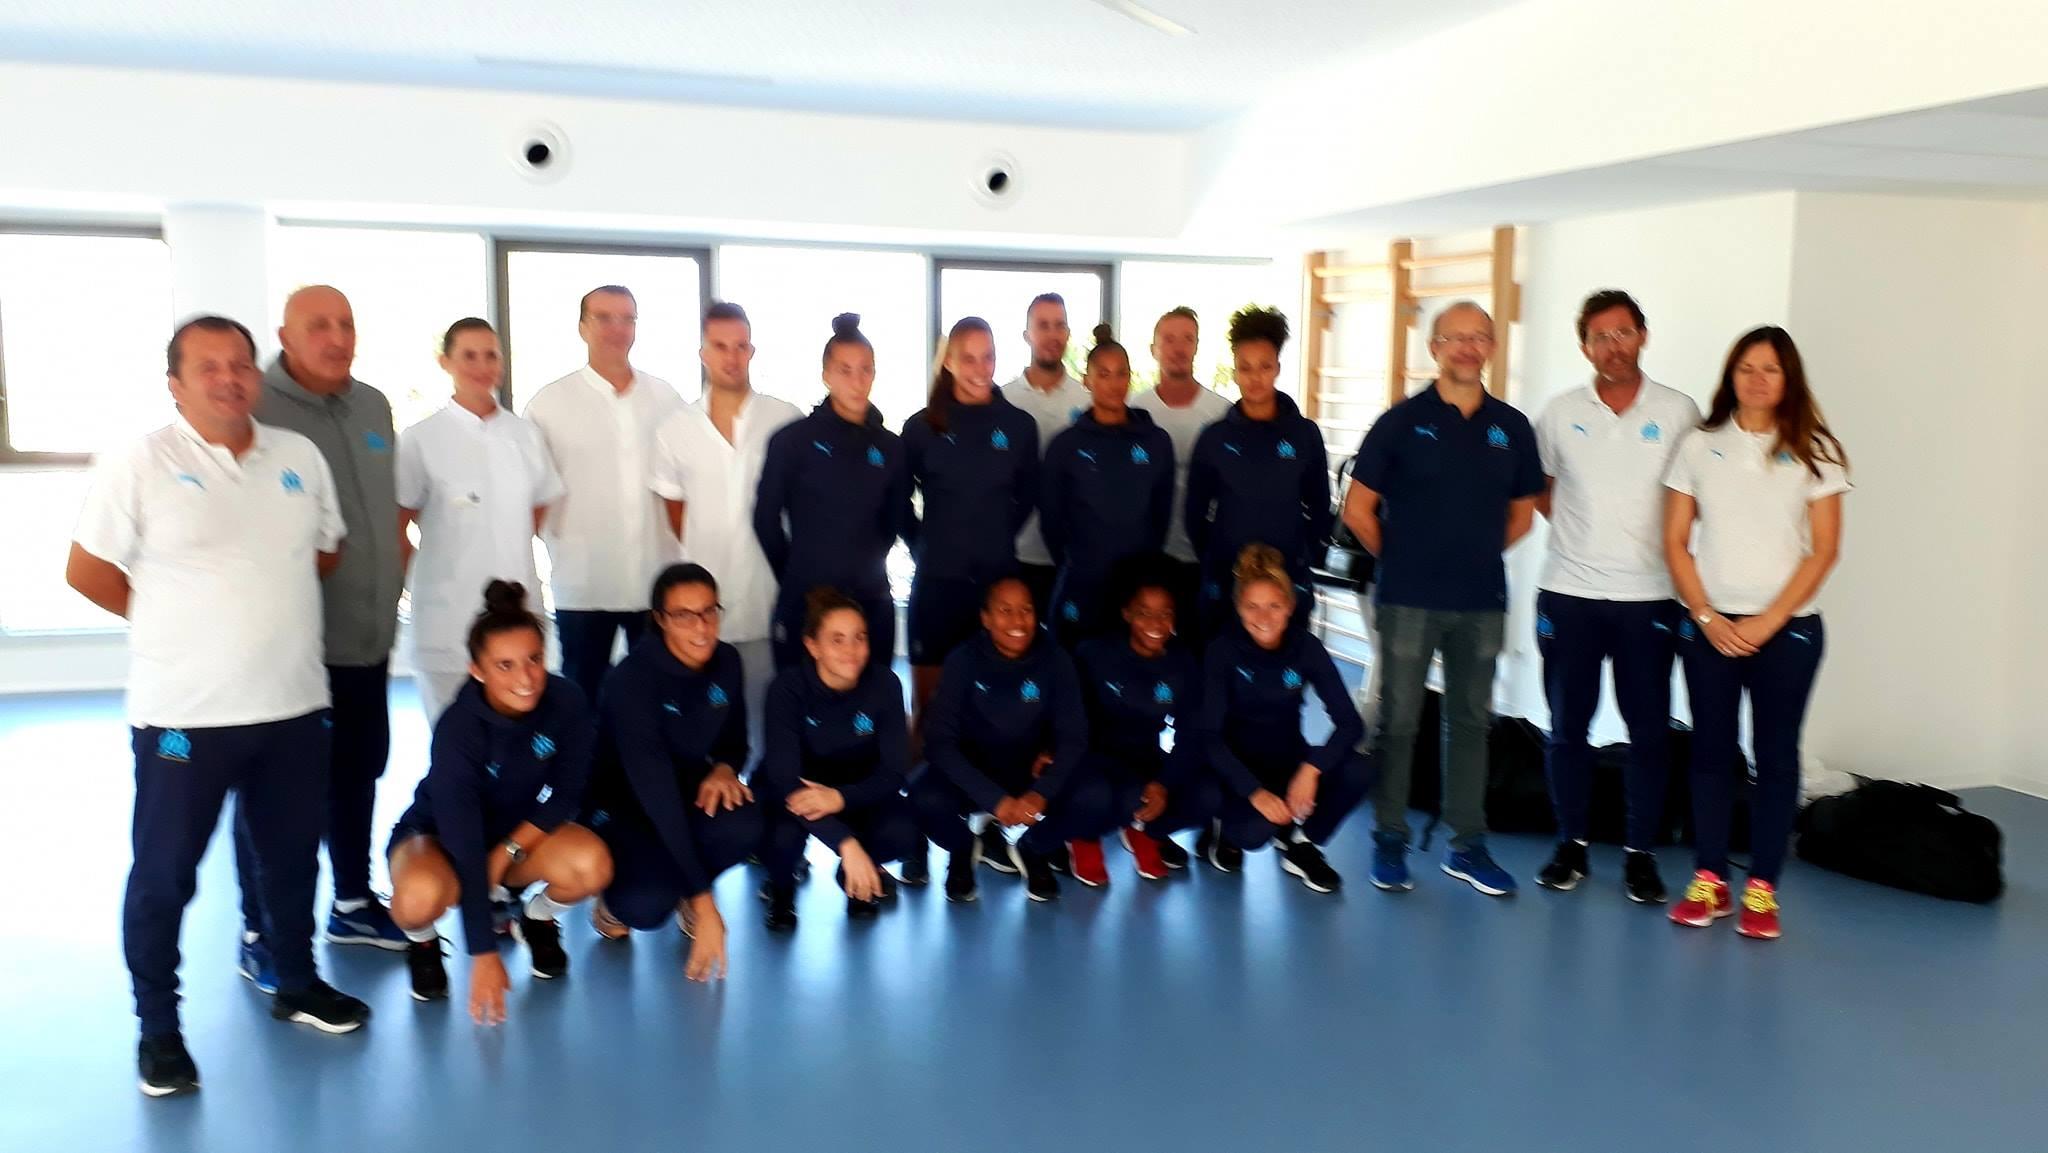 Équipe de football féminine de l'Olympique de Marseille